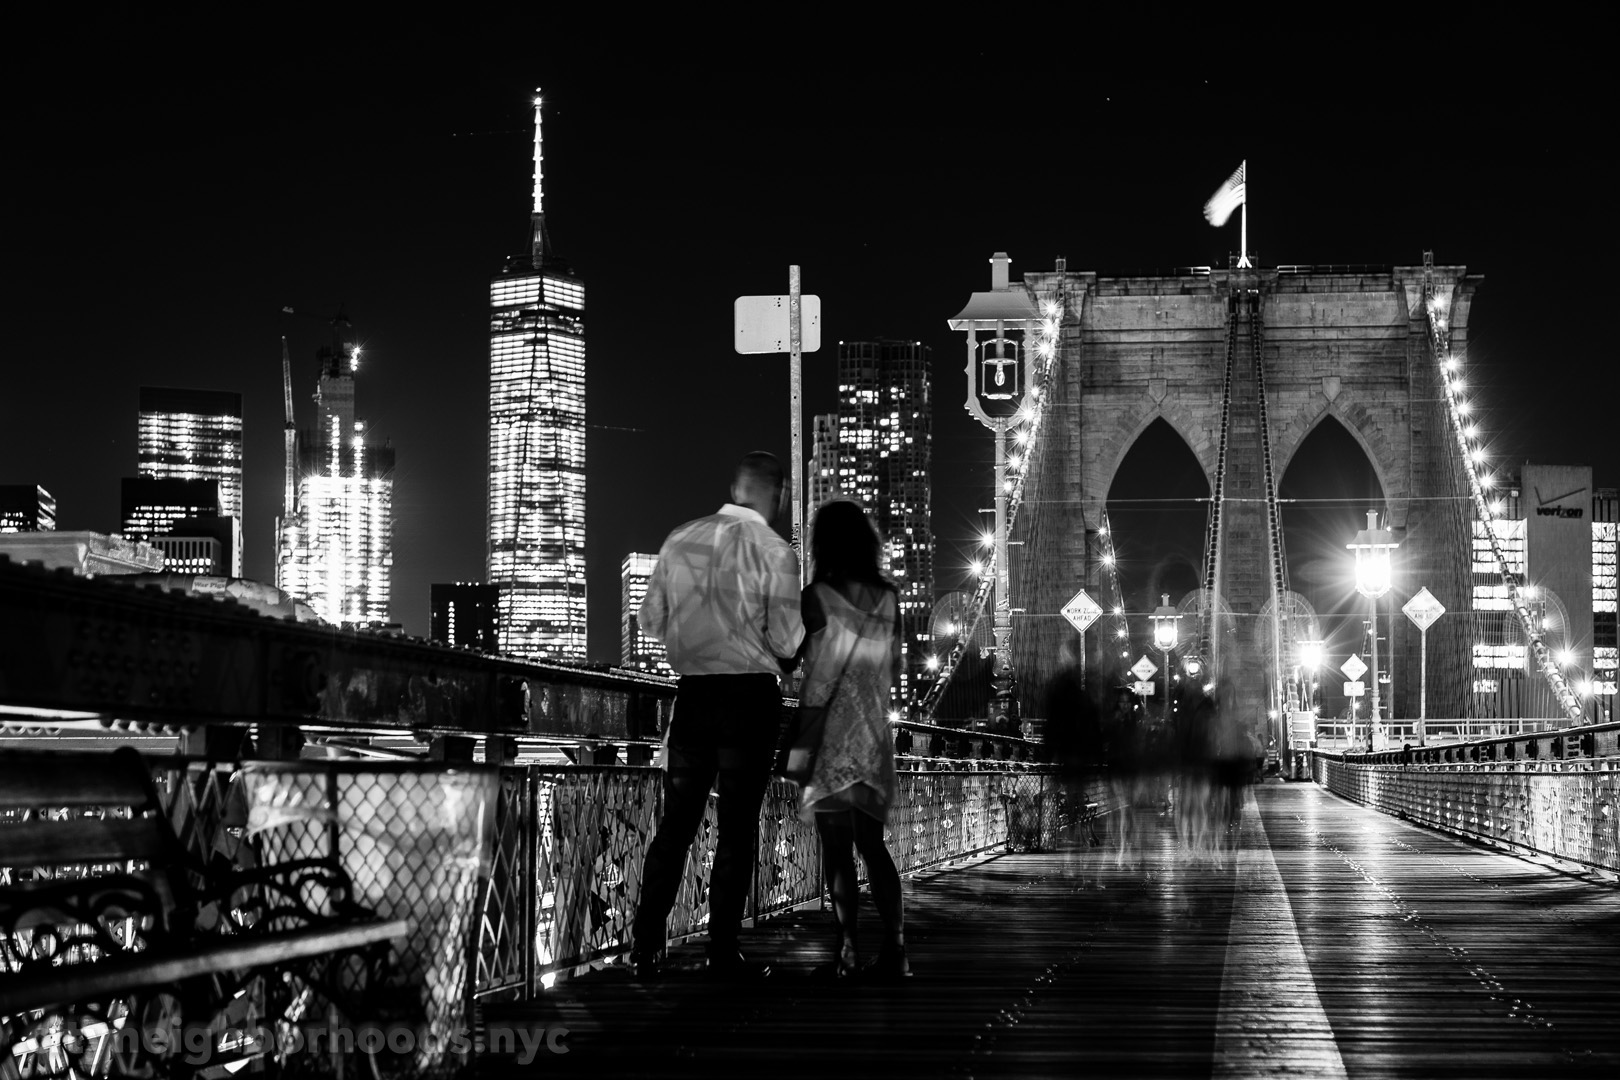 The Brooklyn Bridge - Lower Manhattan - World Trade Center - New York City